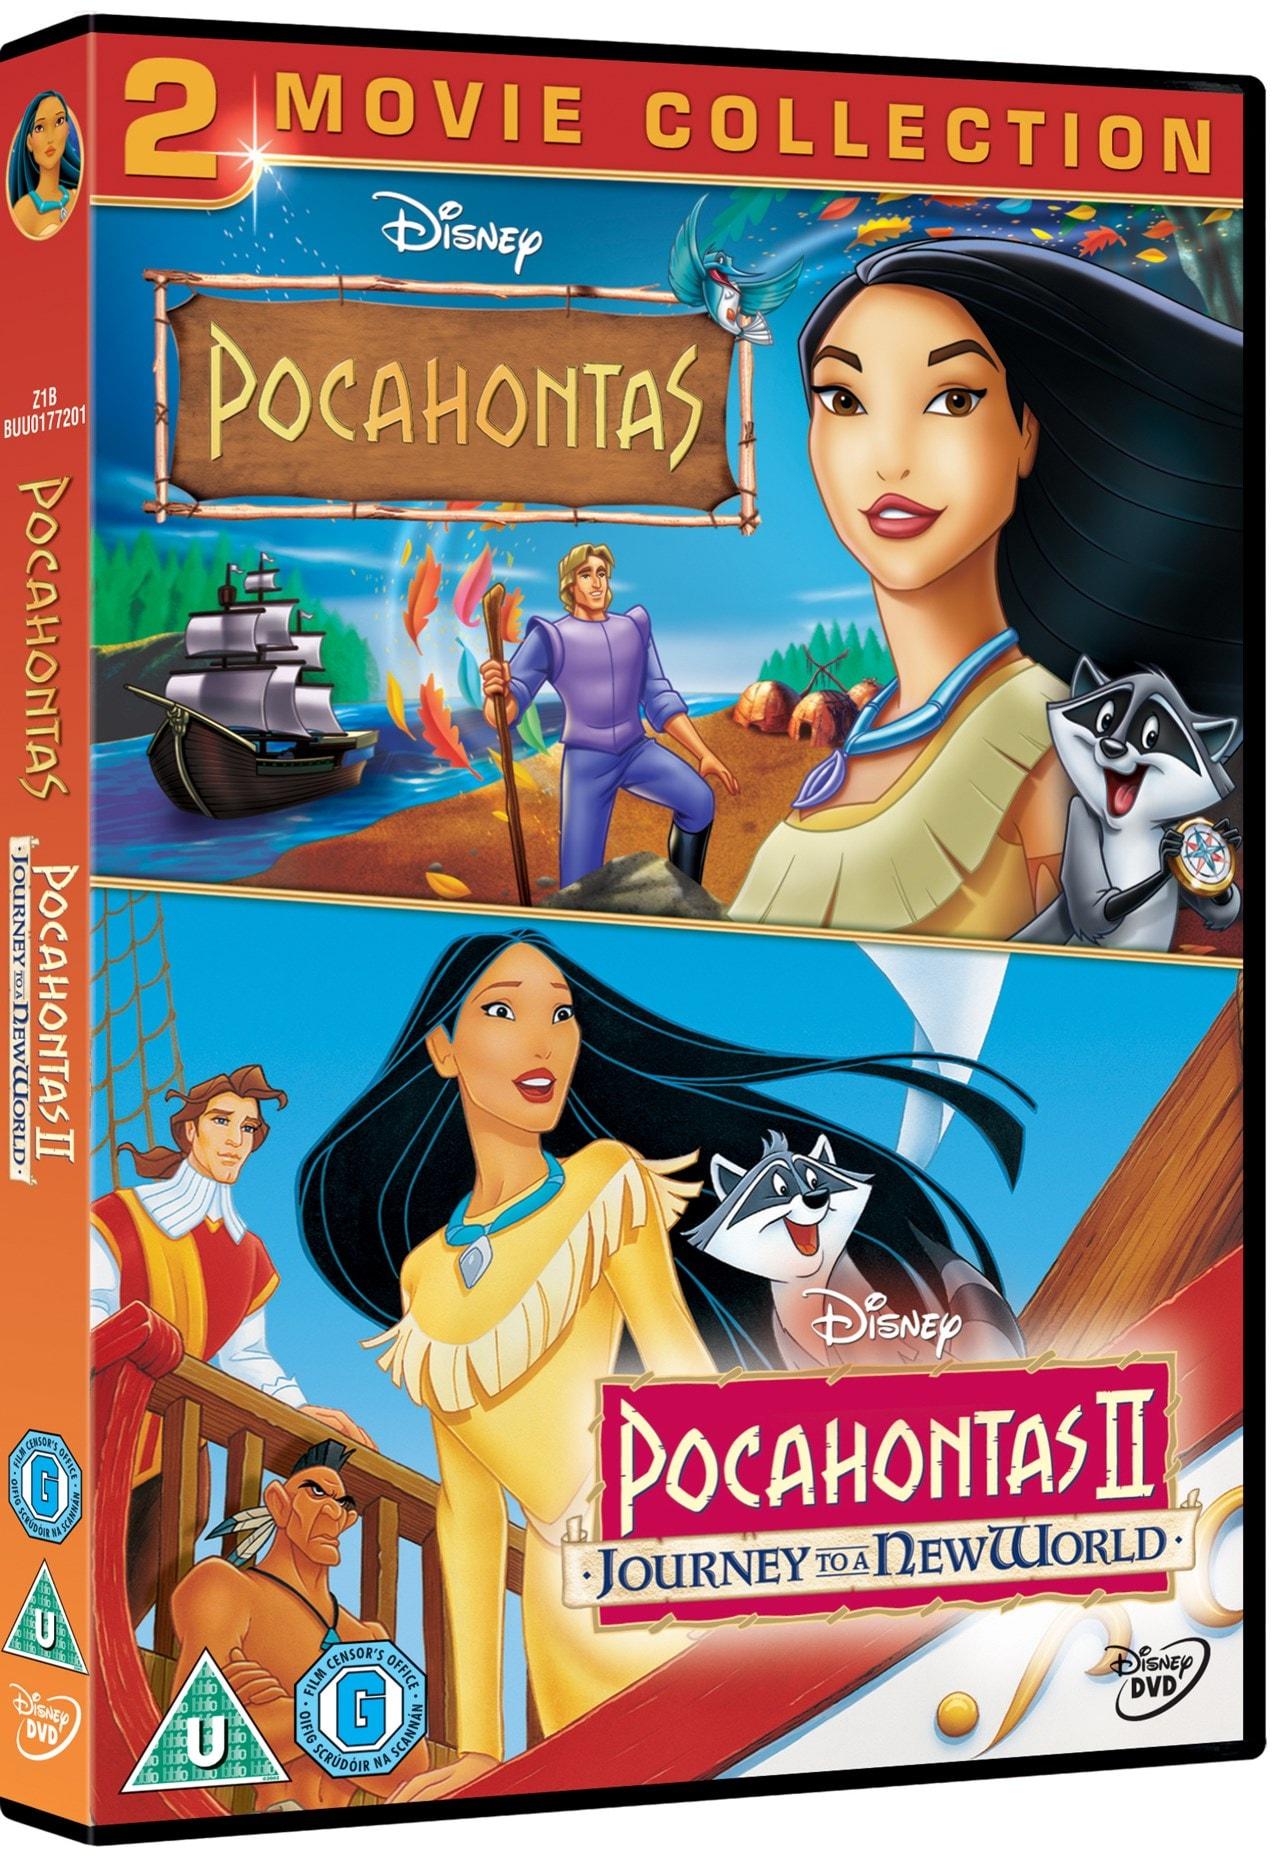 Pocahontas/Pocahontas II - Journey to a New World - 2